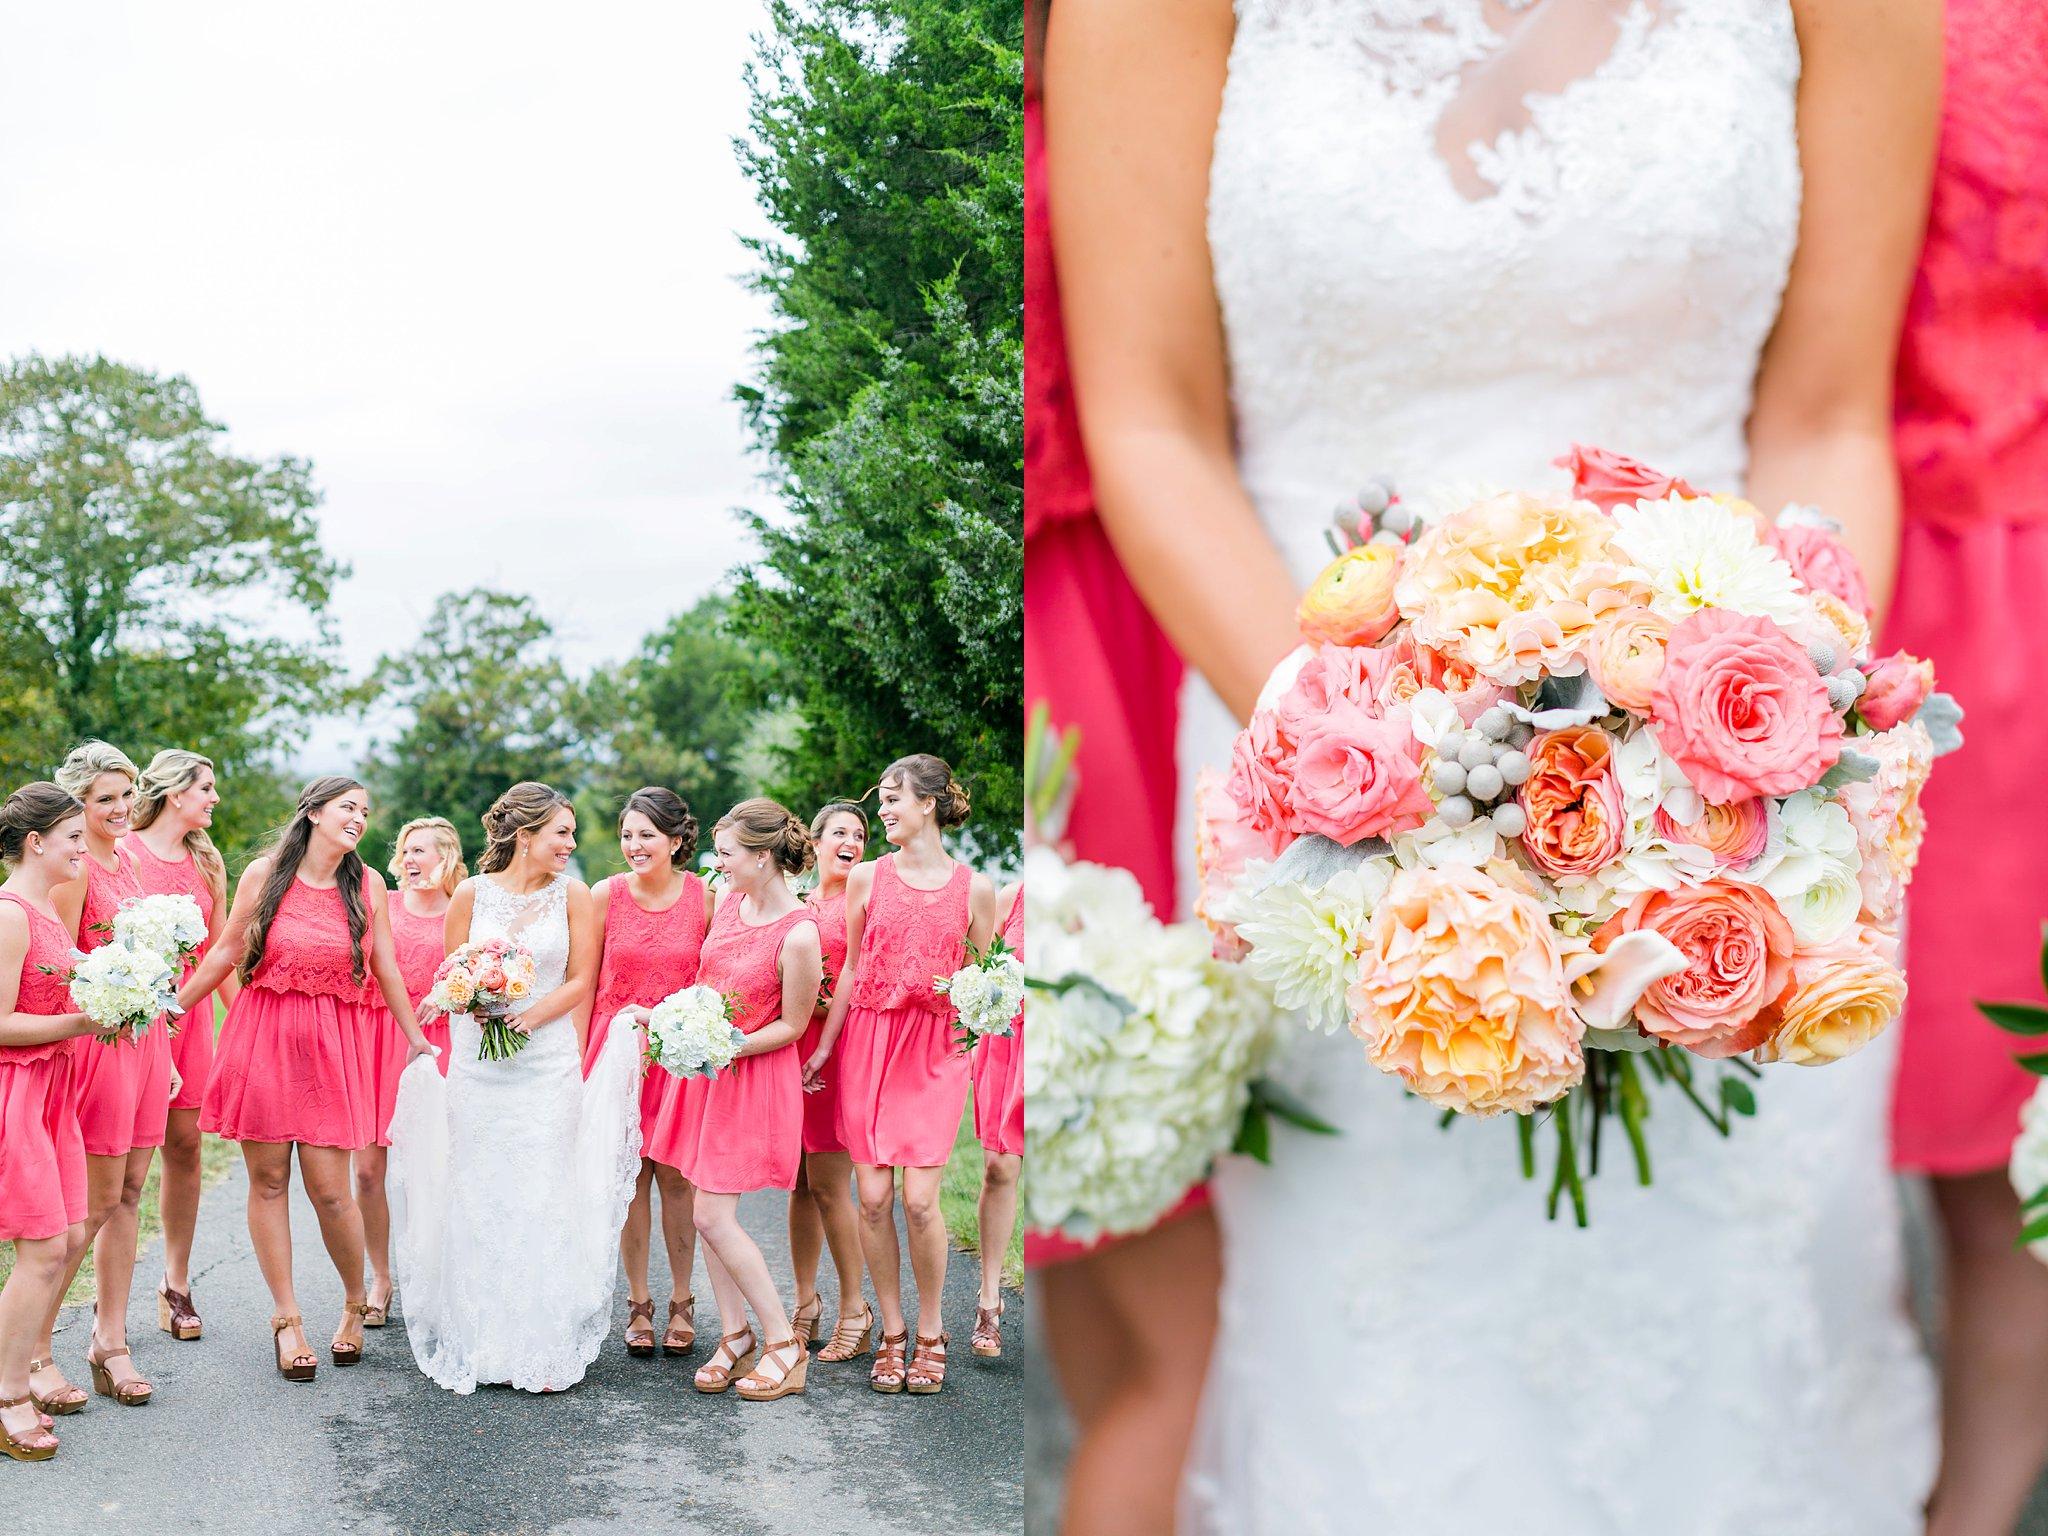 Stone Tower Winery Wedding Photos Virginia Wedding Photographer Megan Kelsey Photography Sam & Angela-56.jpg